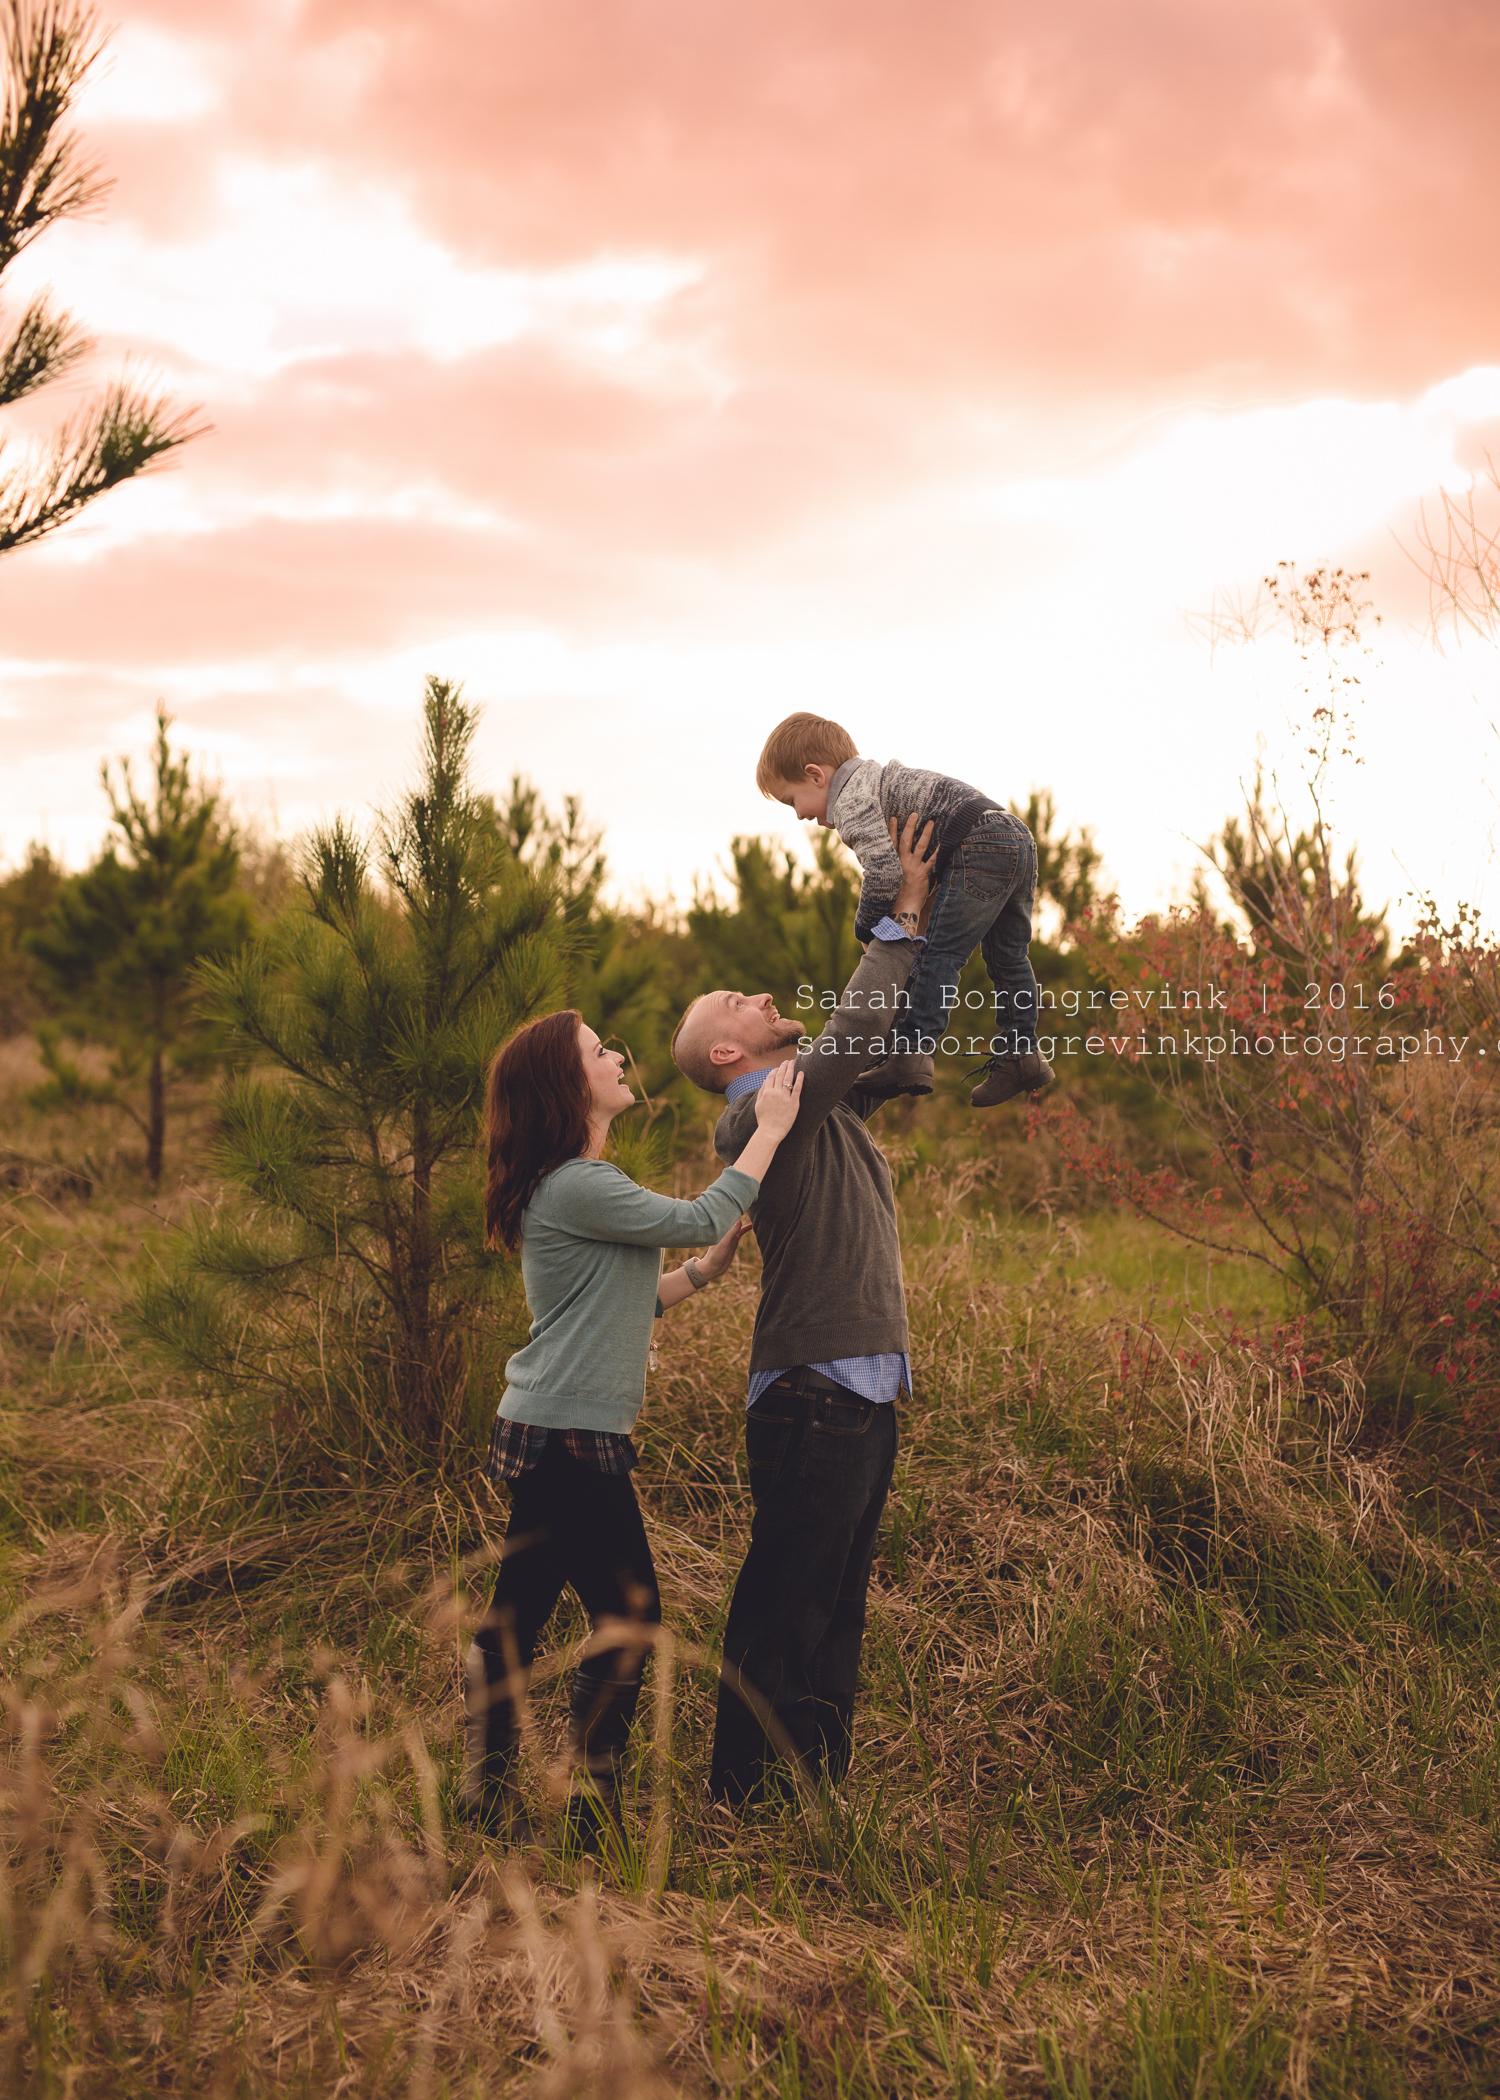 Houston Texas Photography | Sarah Borchgrevink | Family & Baby Photos